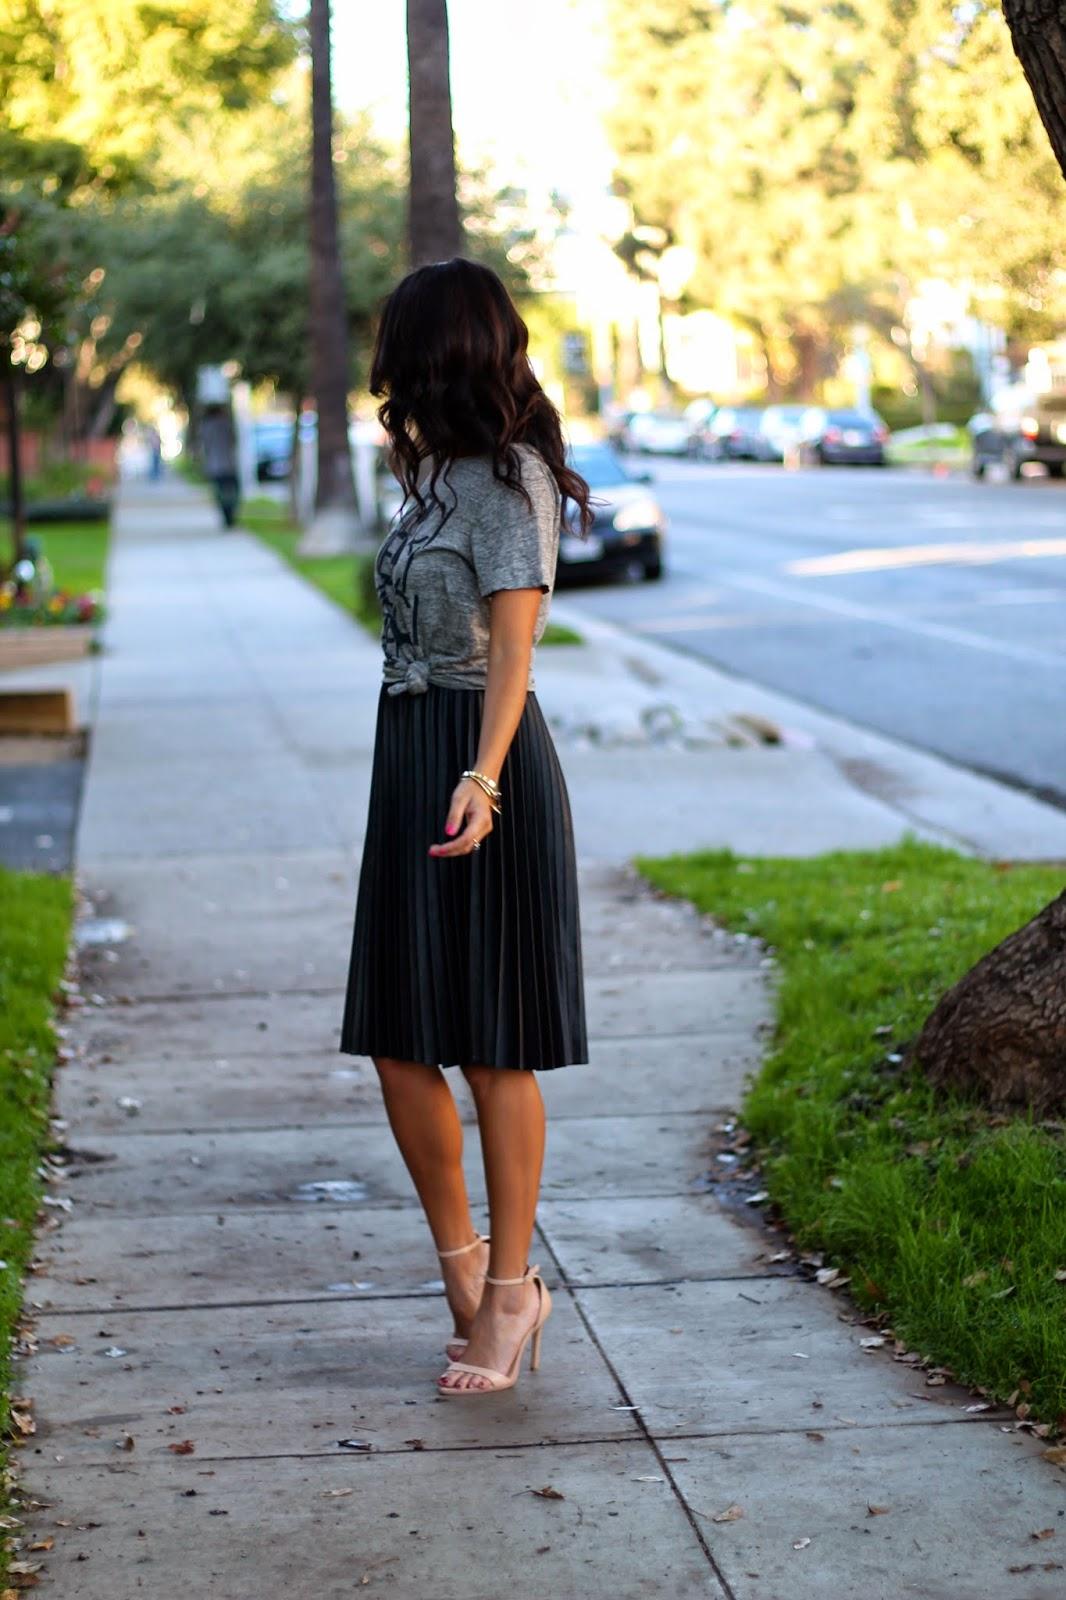 graphic shirt and skirt